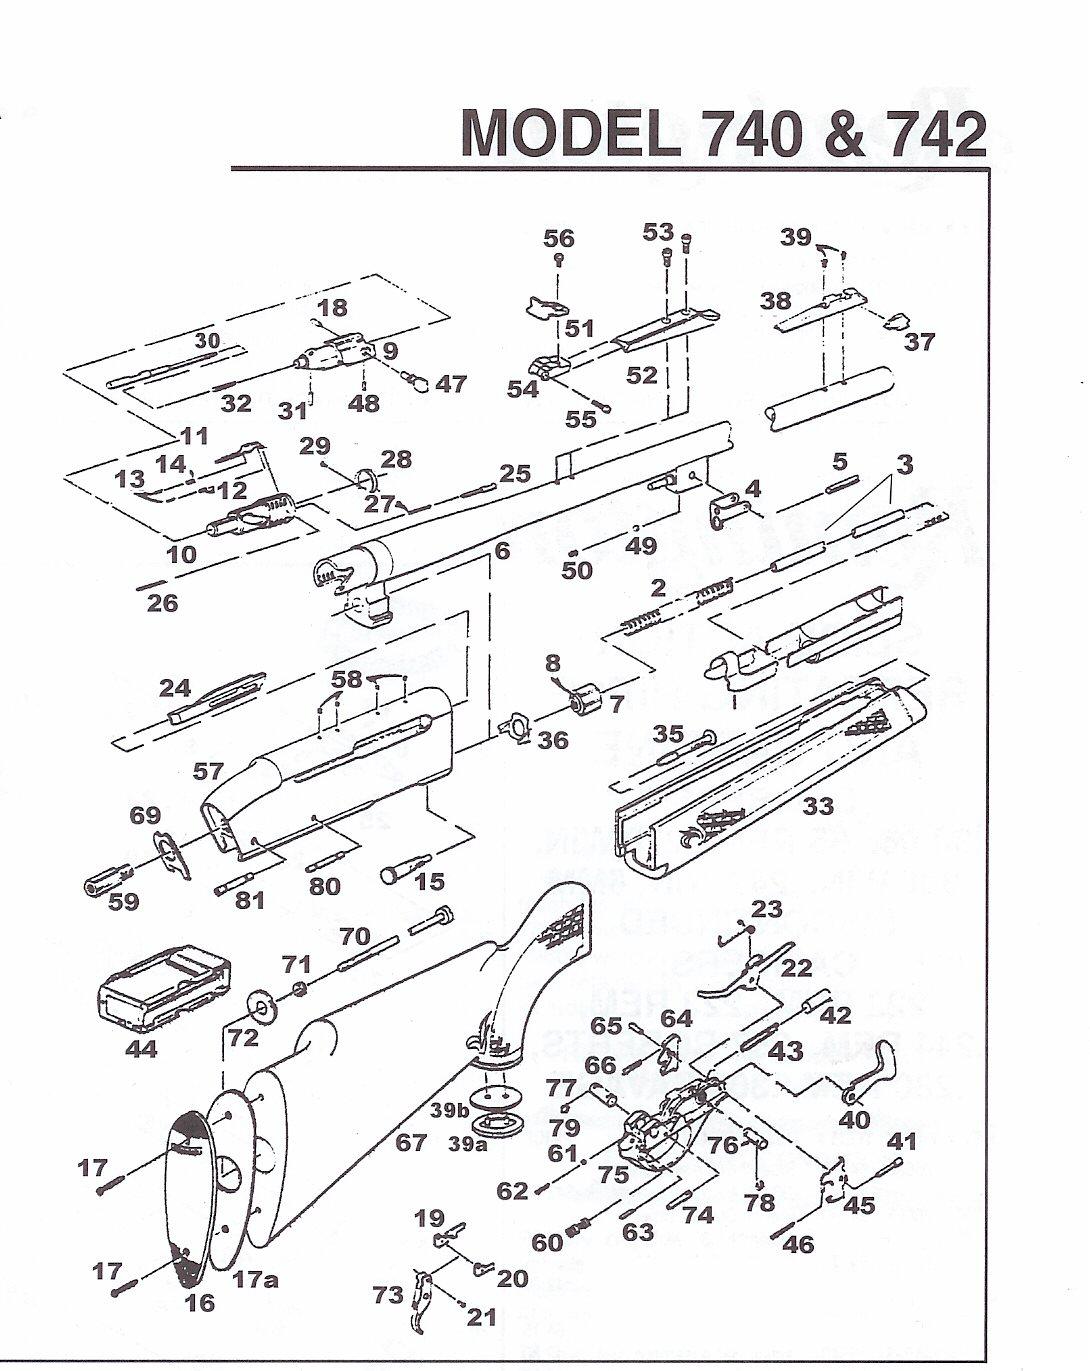 savage model 110 parts diagram ford 4r70w transmission remington 11 free engine